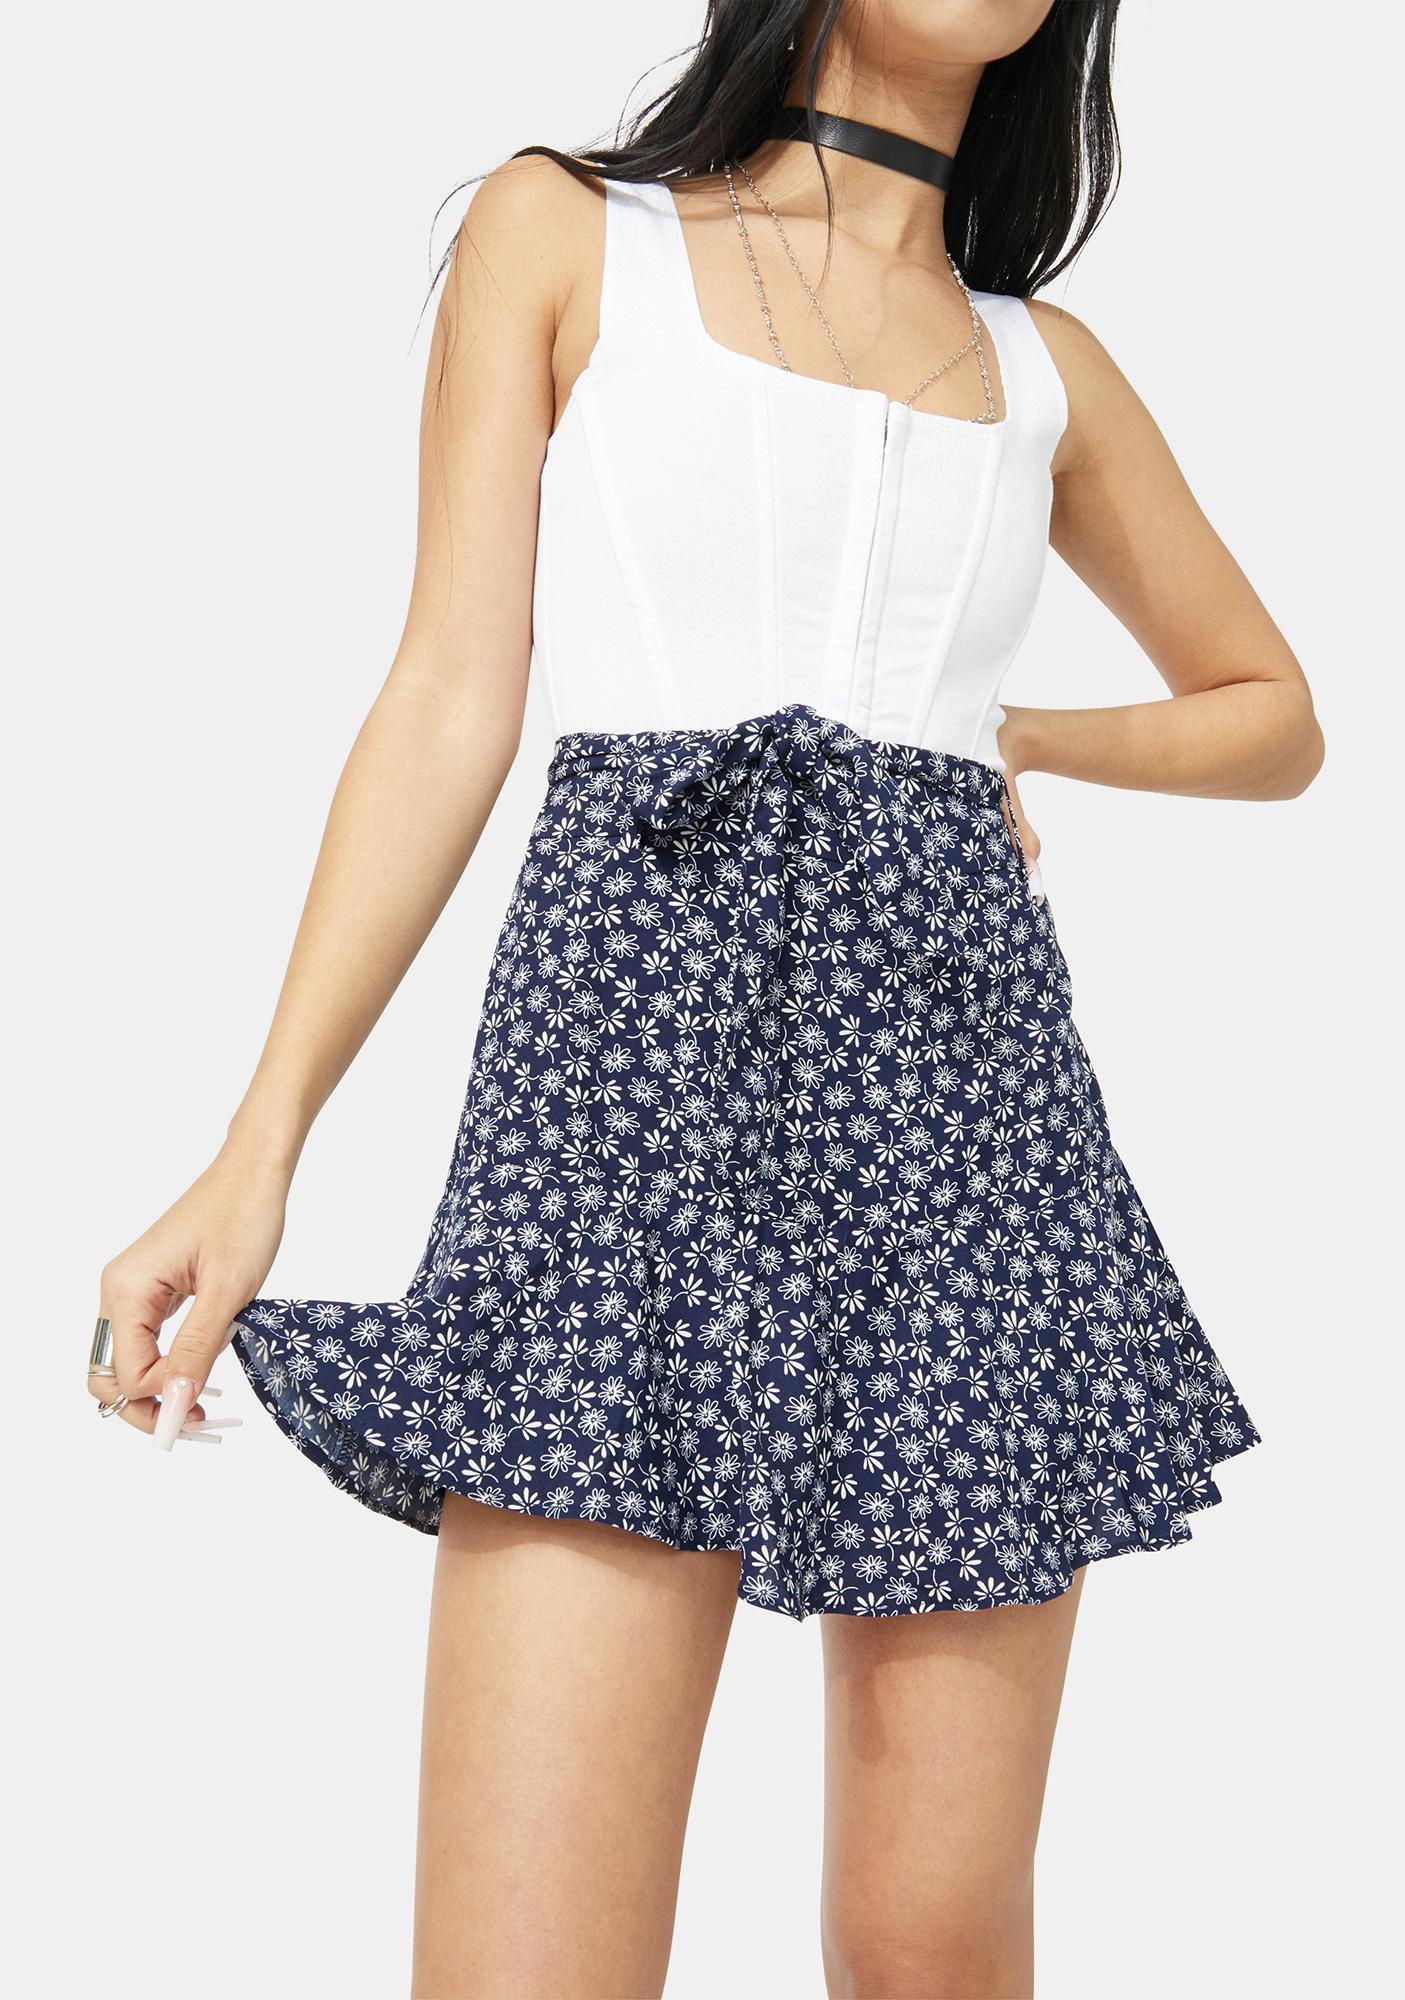 Floral Tie Waist Wraparound Mini Skirt - Navy Blue | Dolls Kill